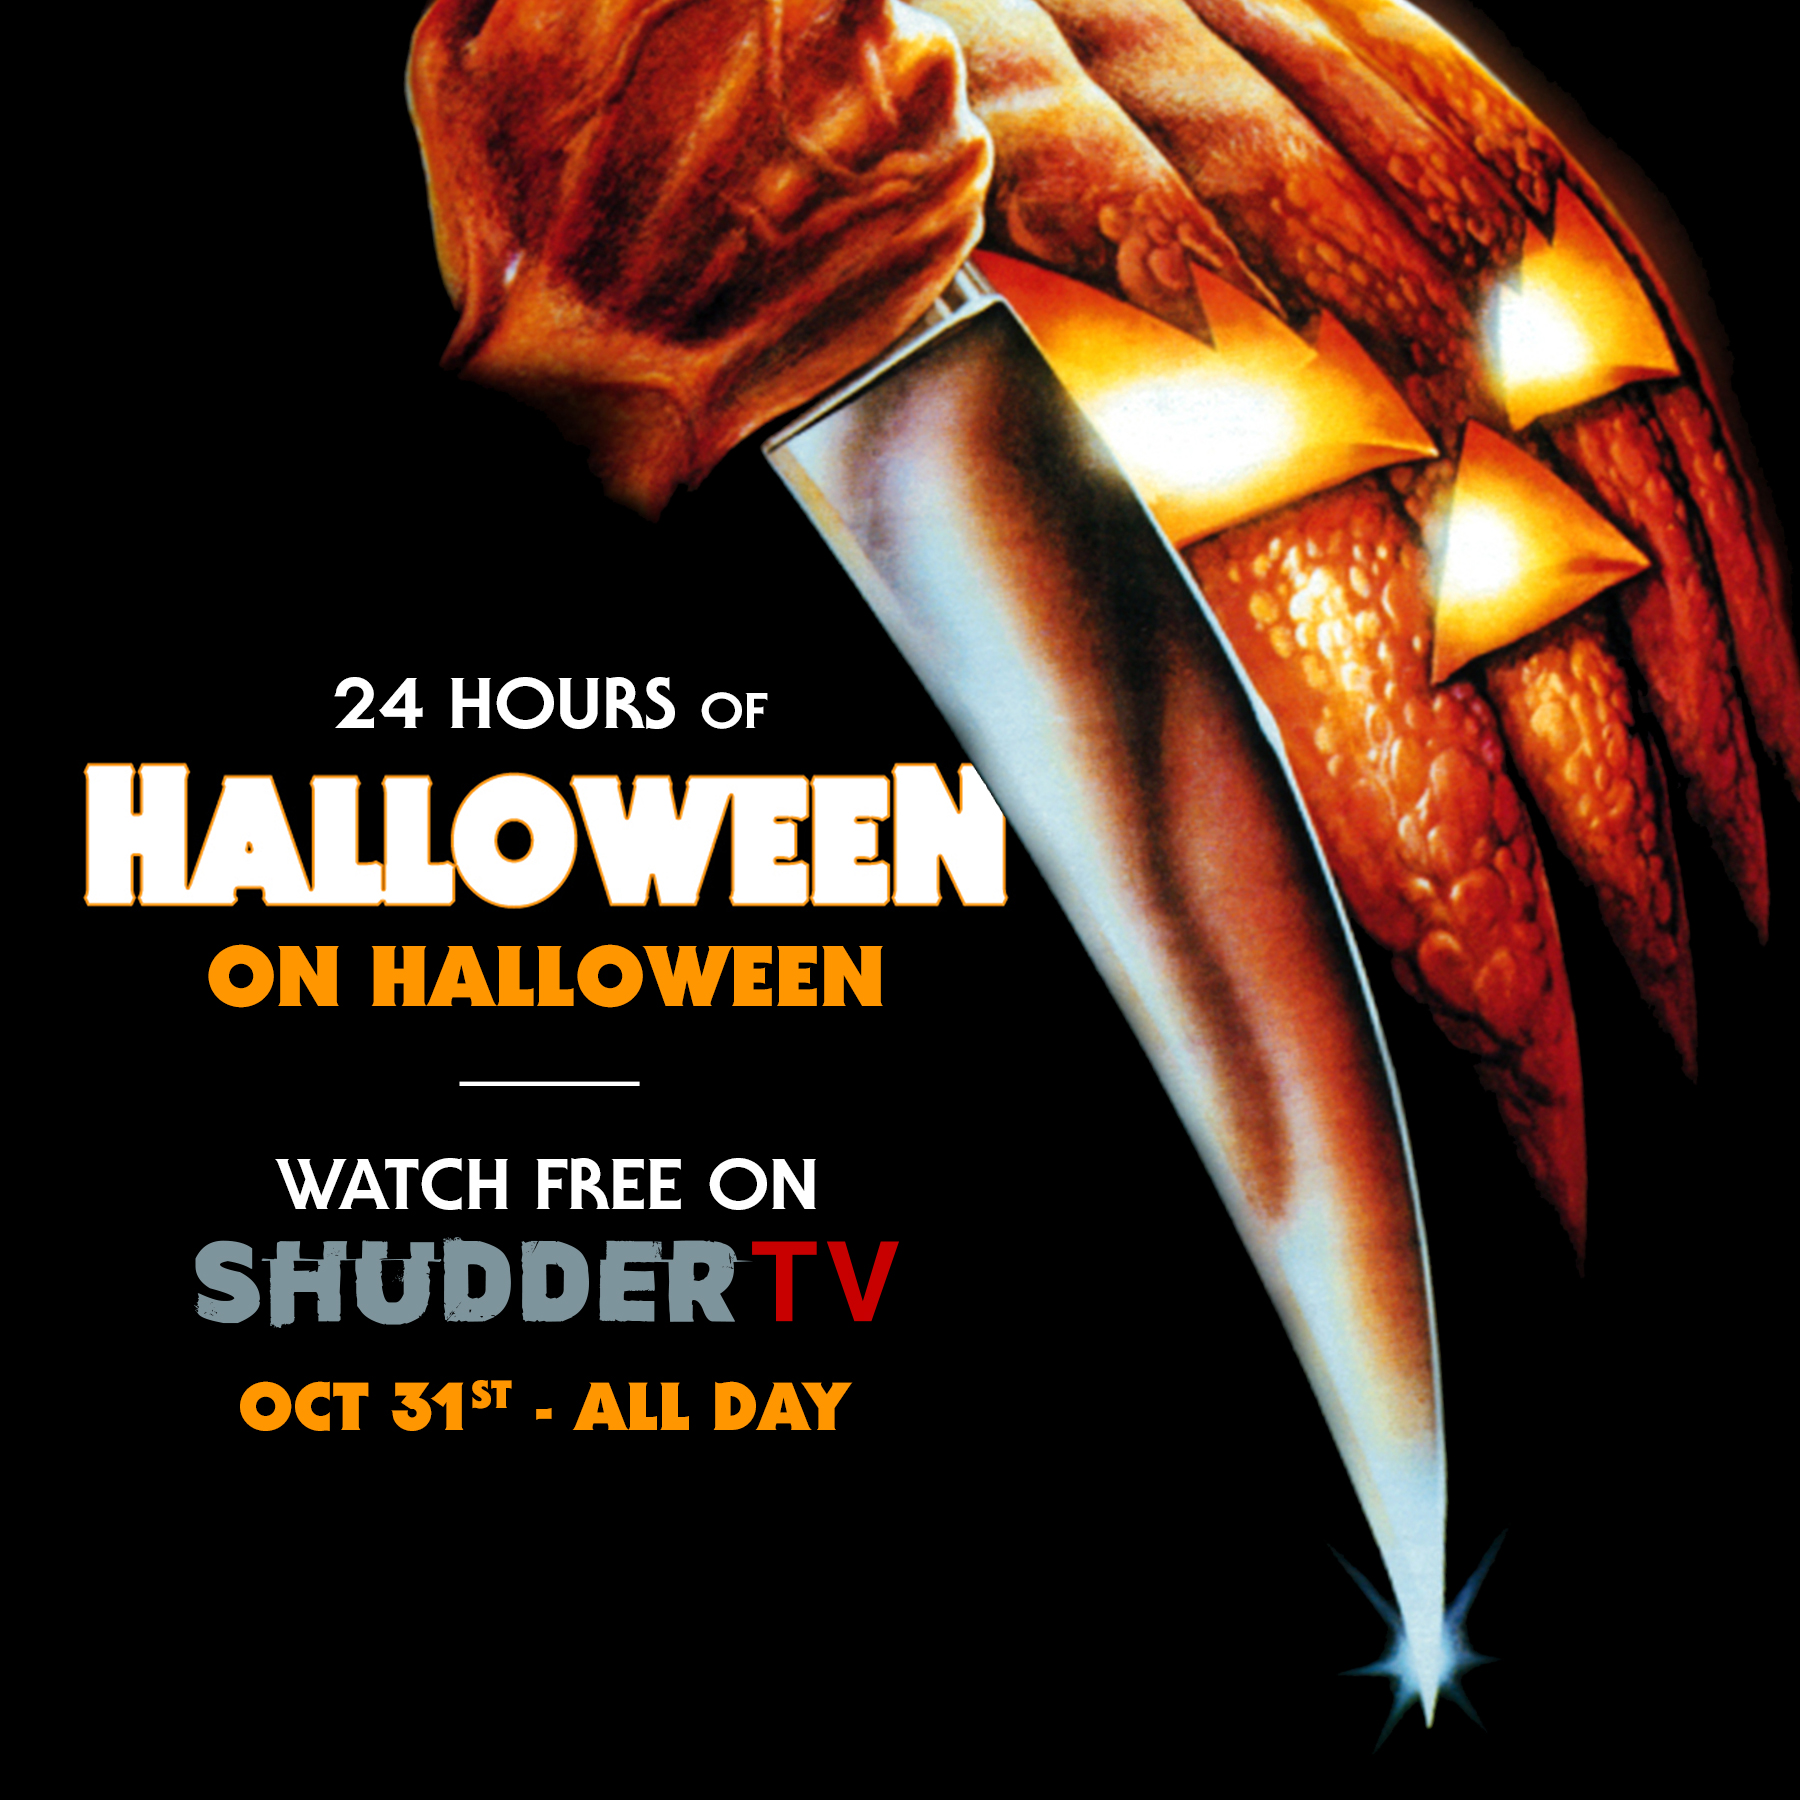 Shudder Halloween